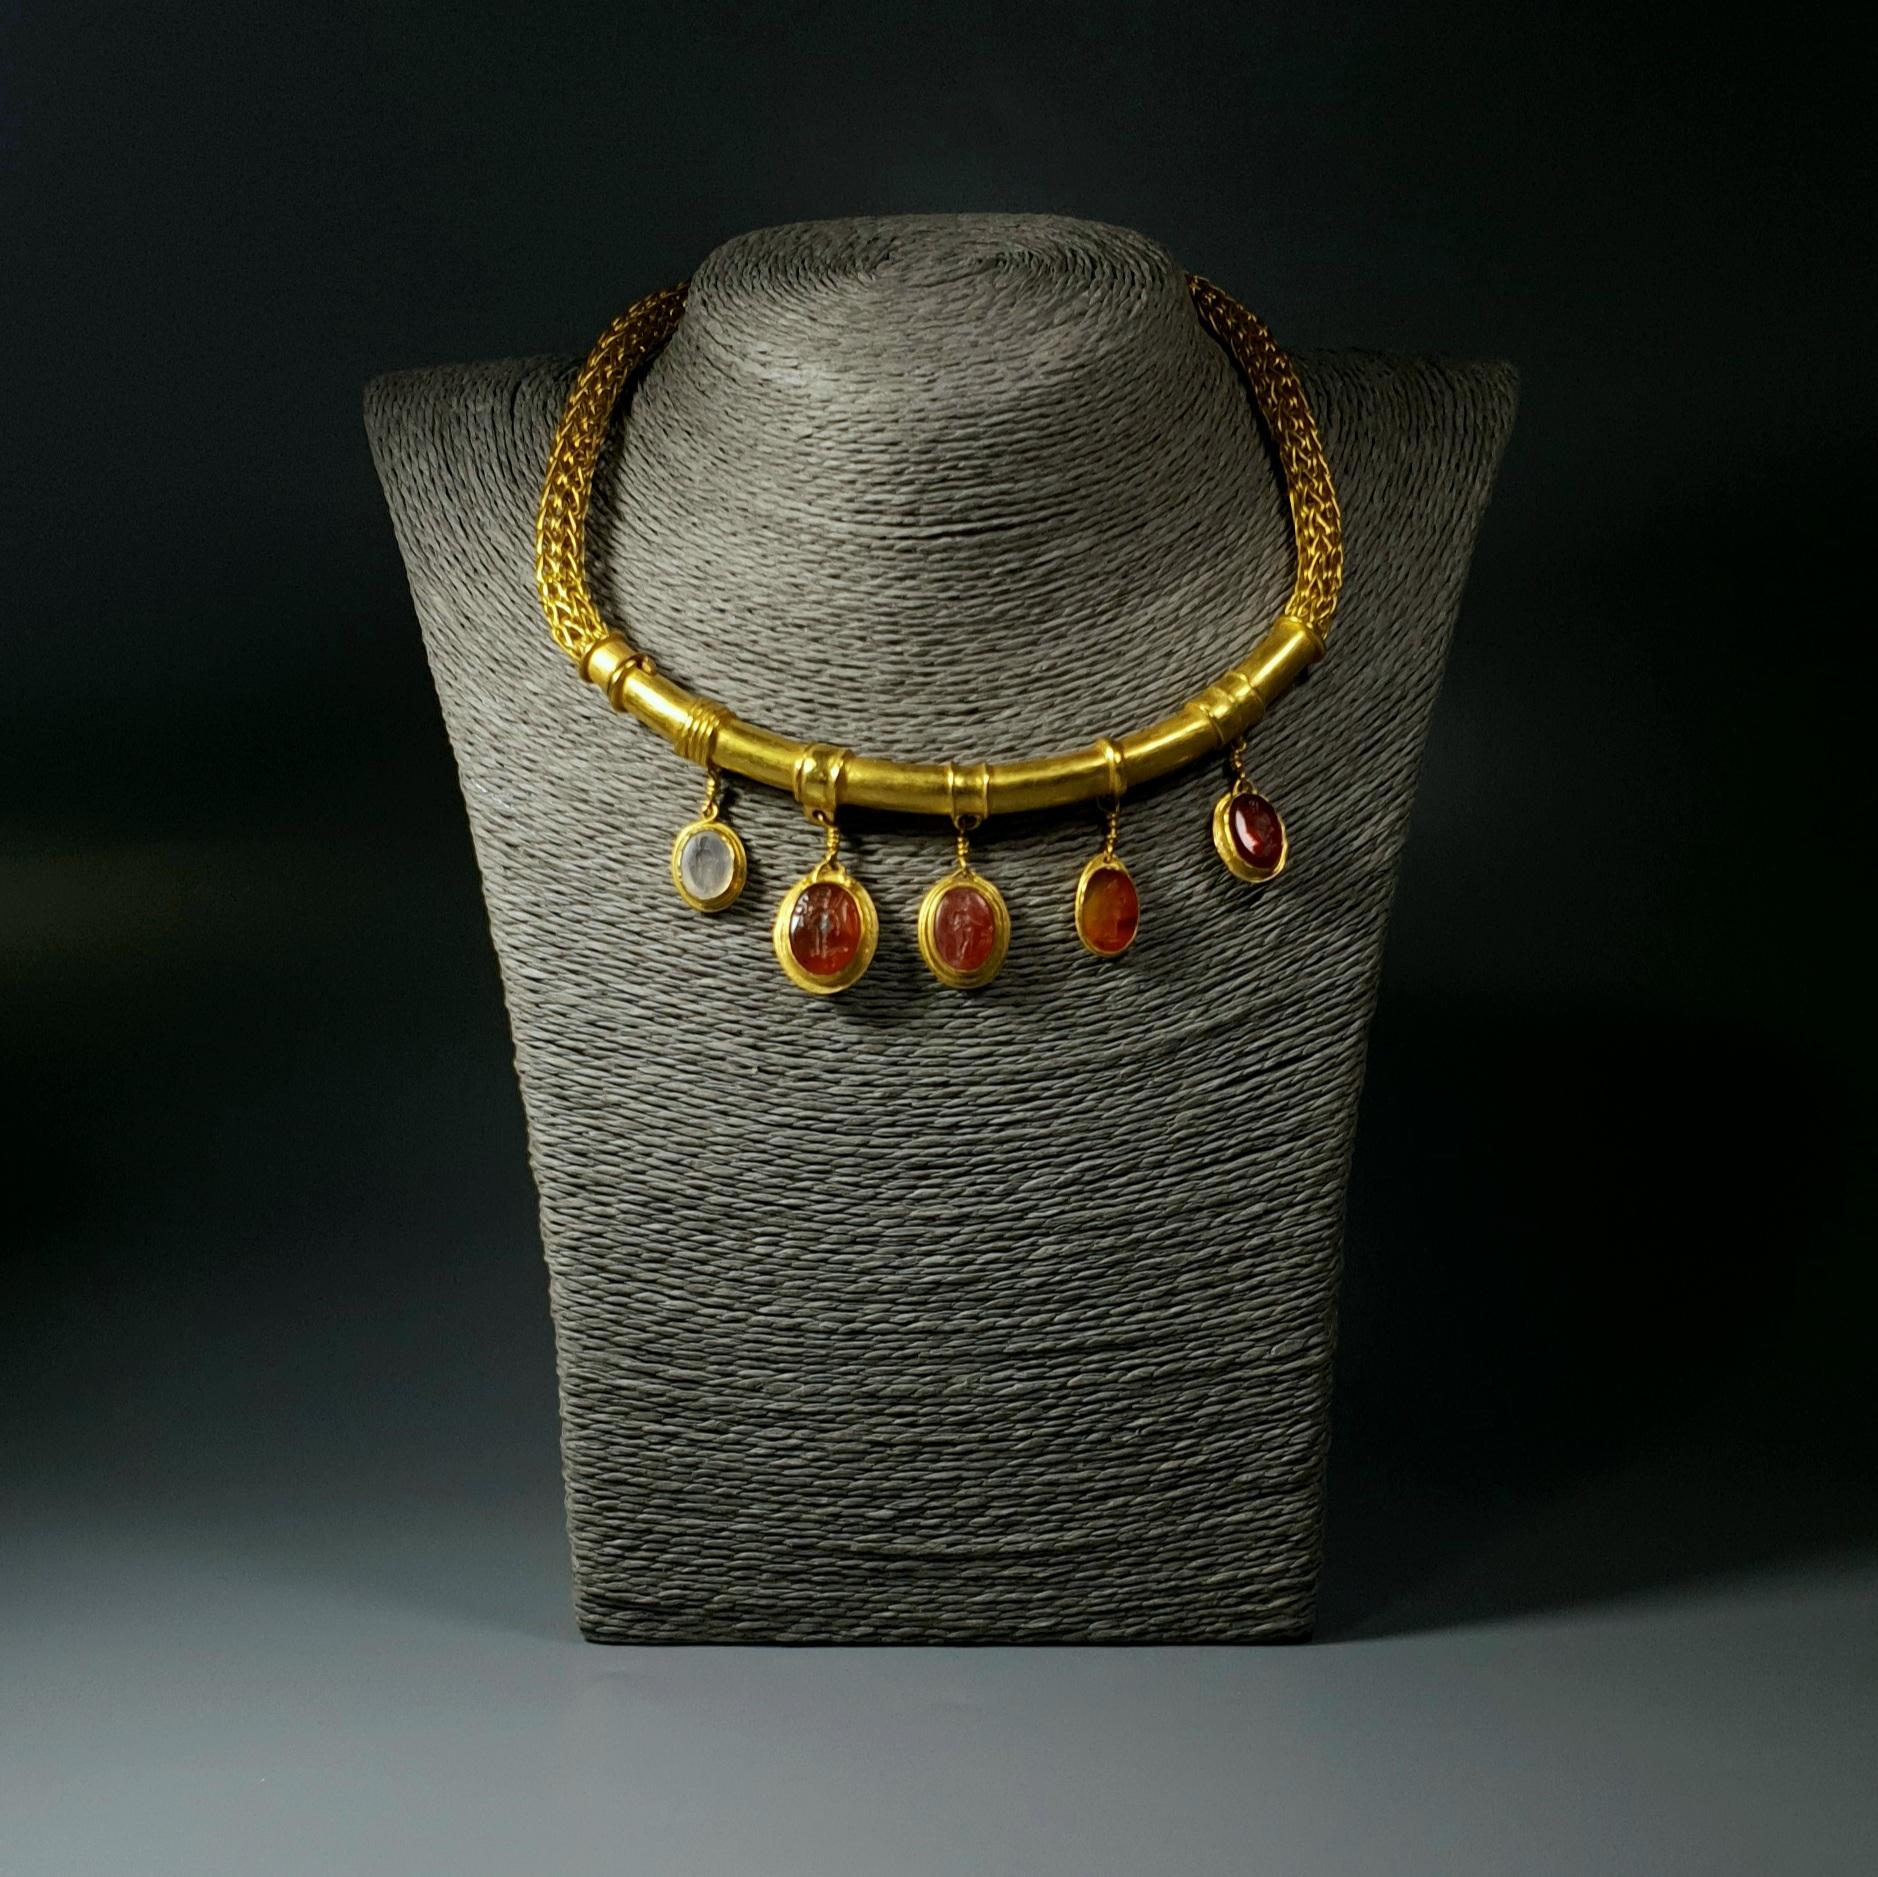 Antique Jewelry Gold Necklace Gemstones